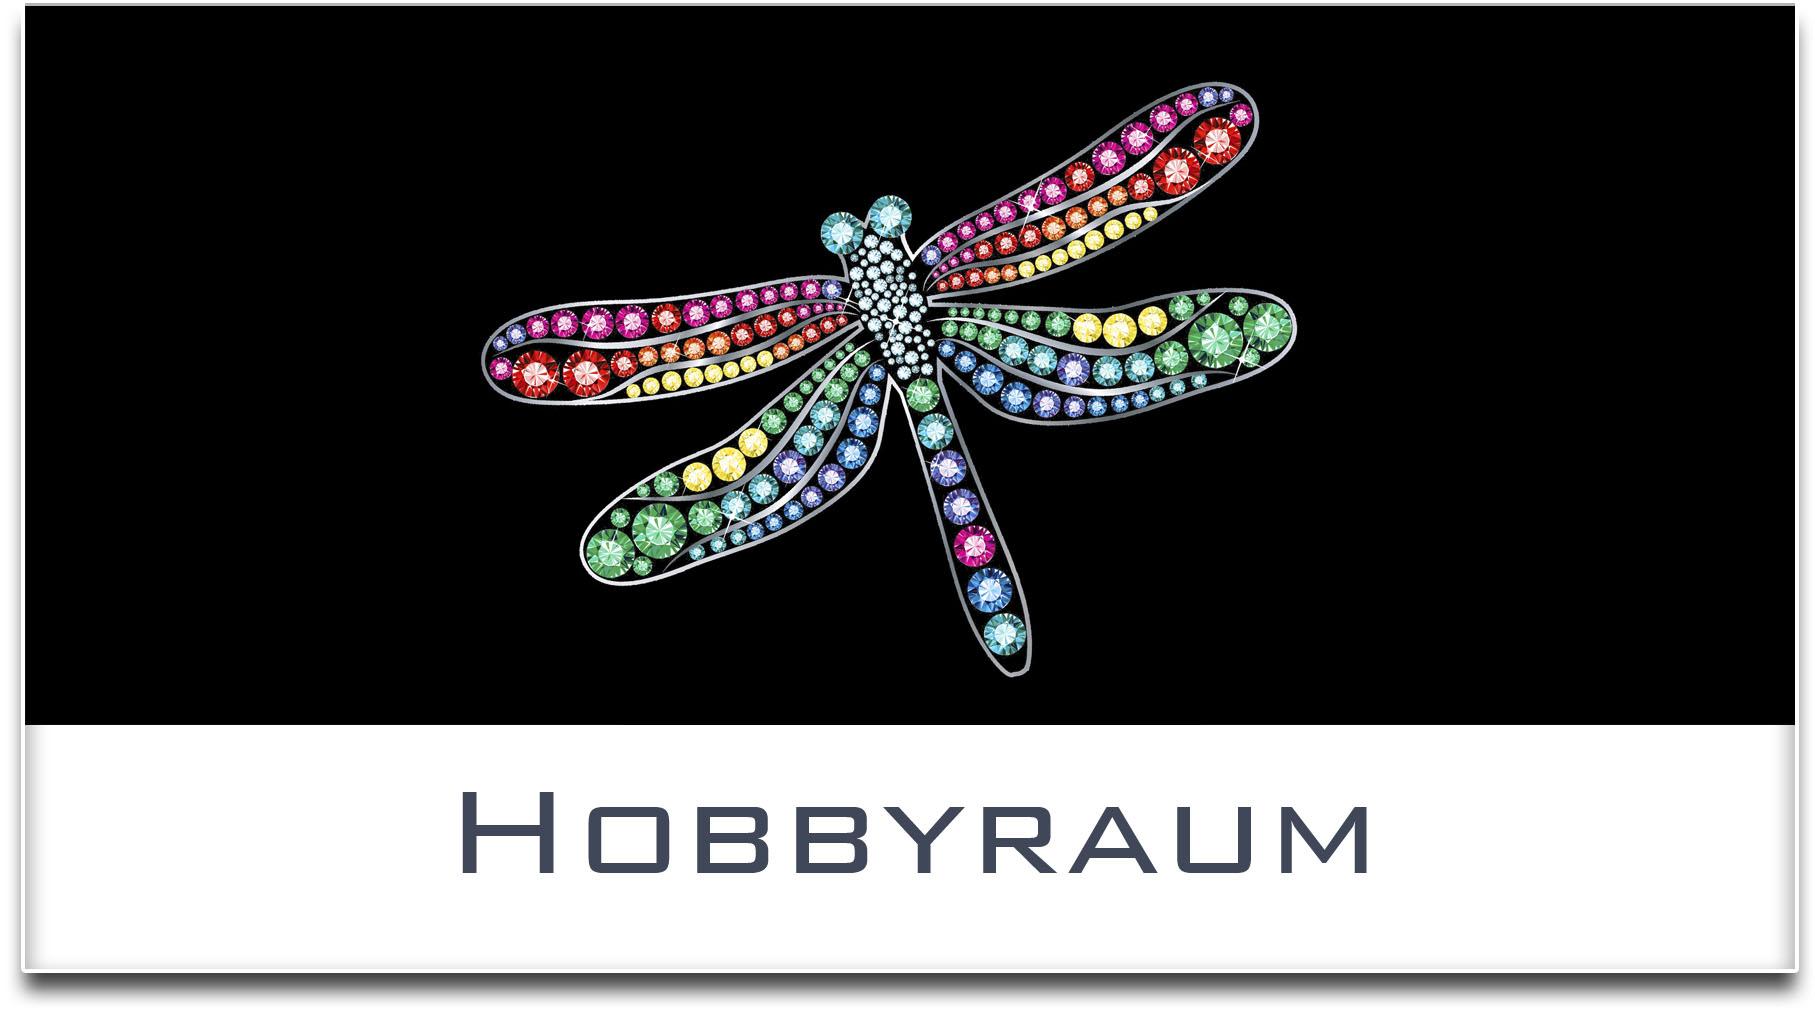 Türschild / Haustürschild / Libelle / Hobbyraum / Selbstklebend